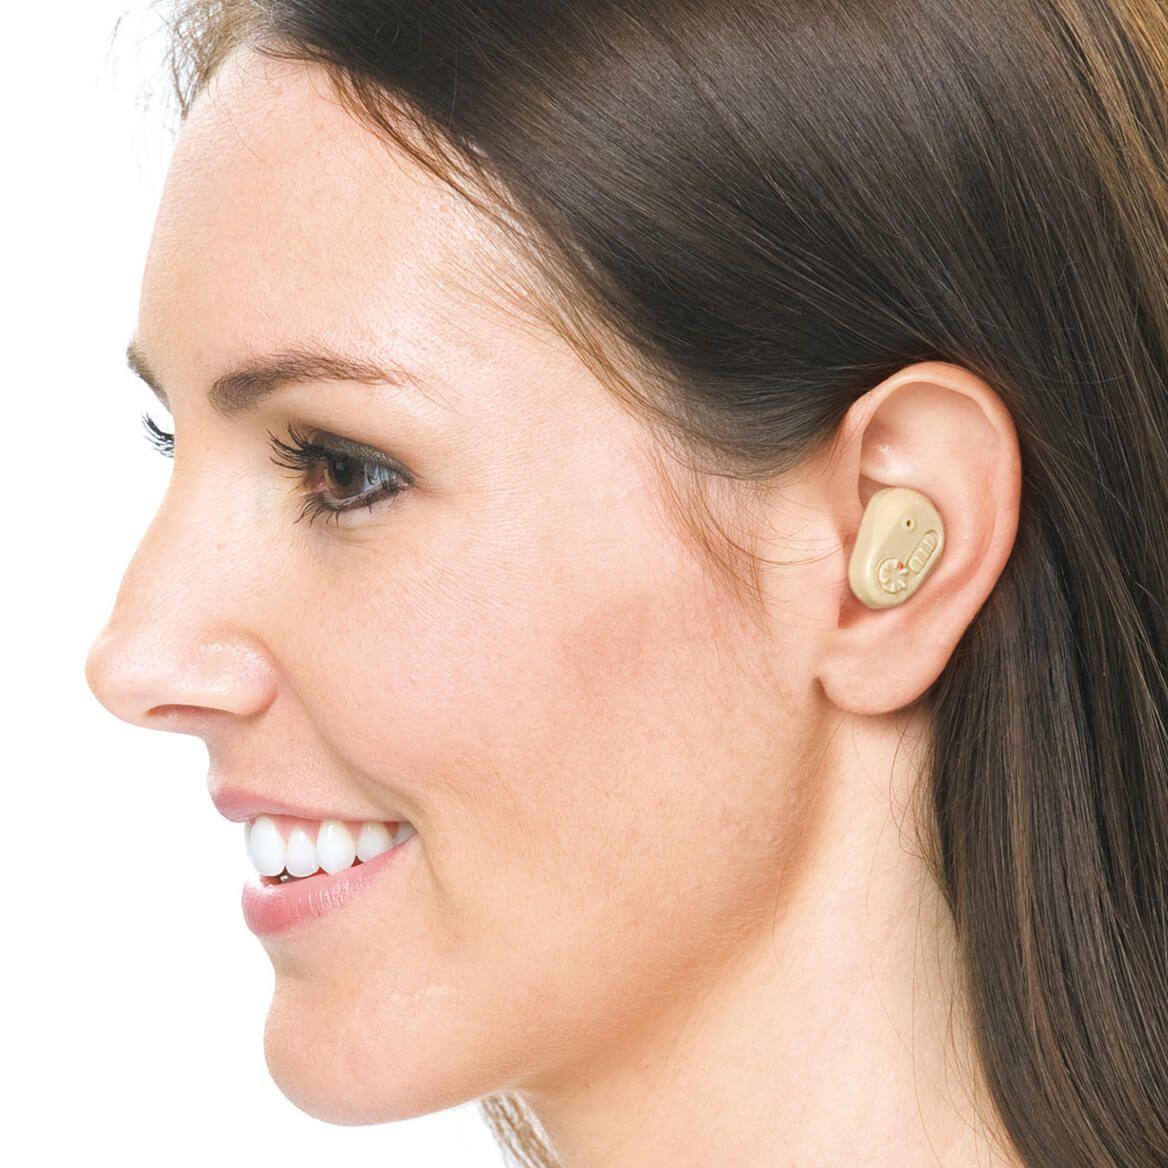 Rechargeable Turbo Ear TM-306691